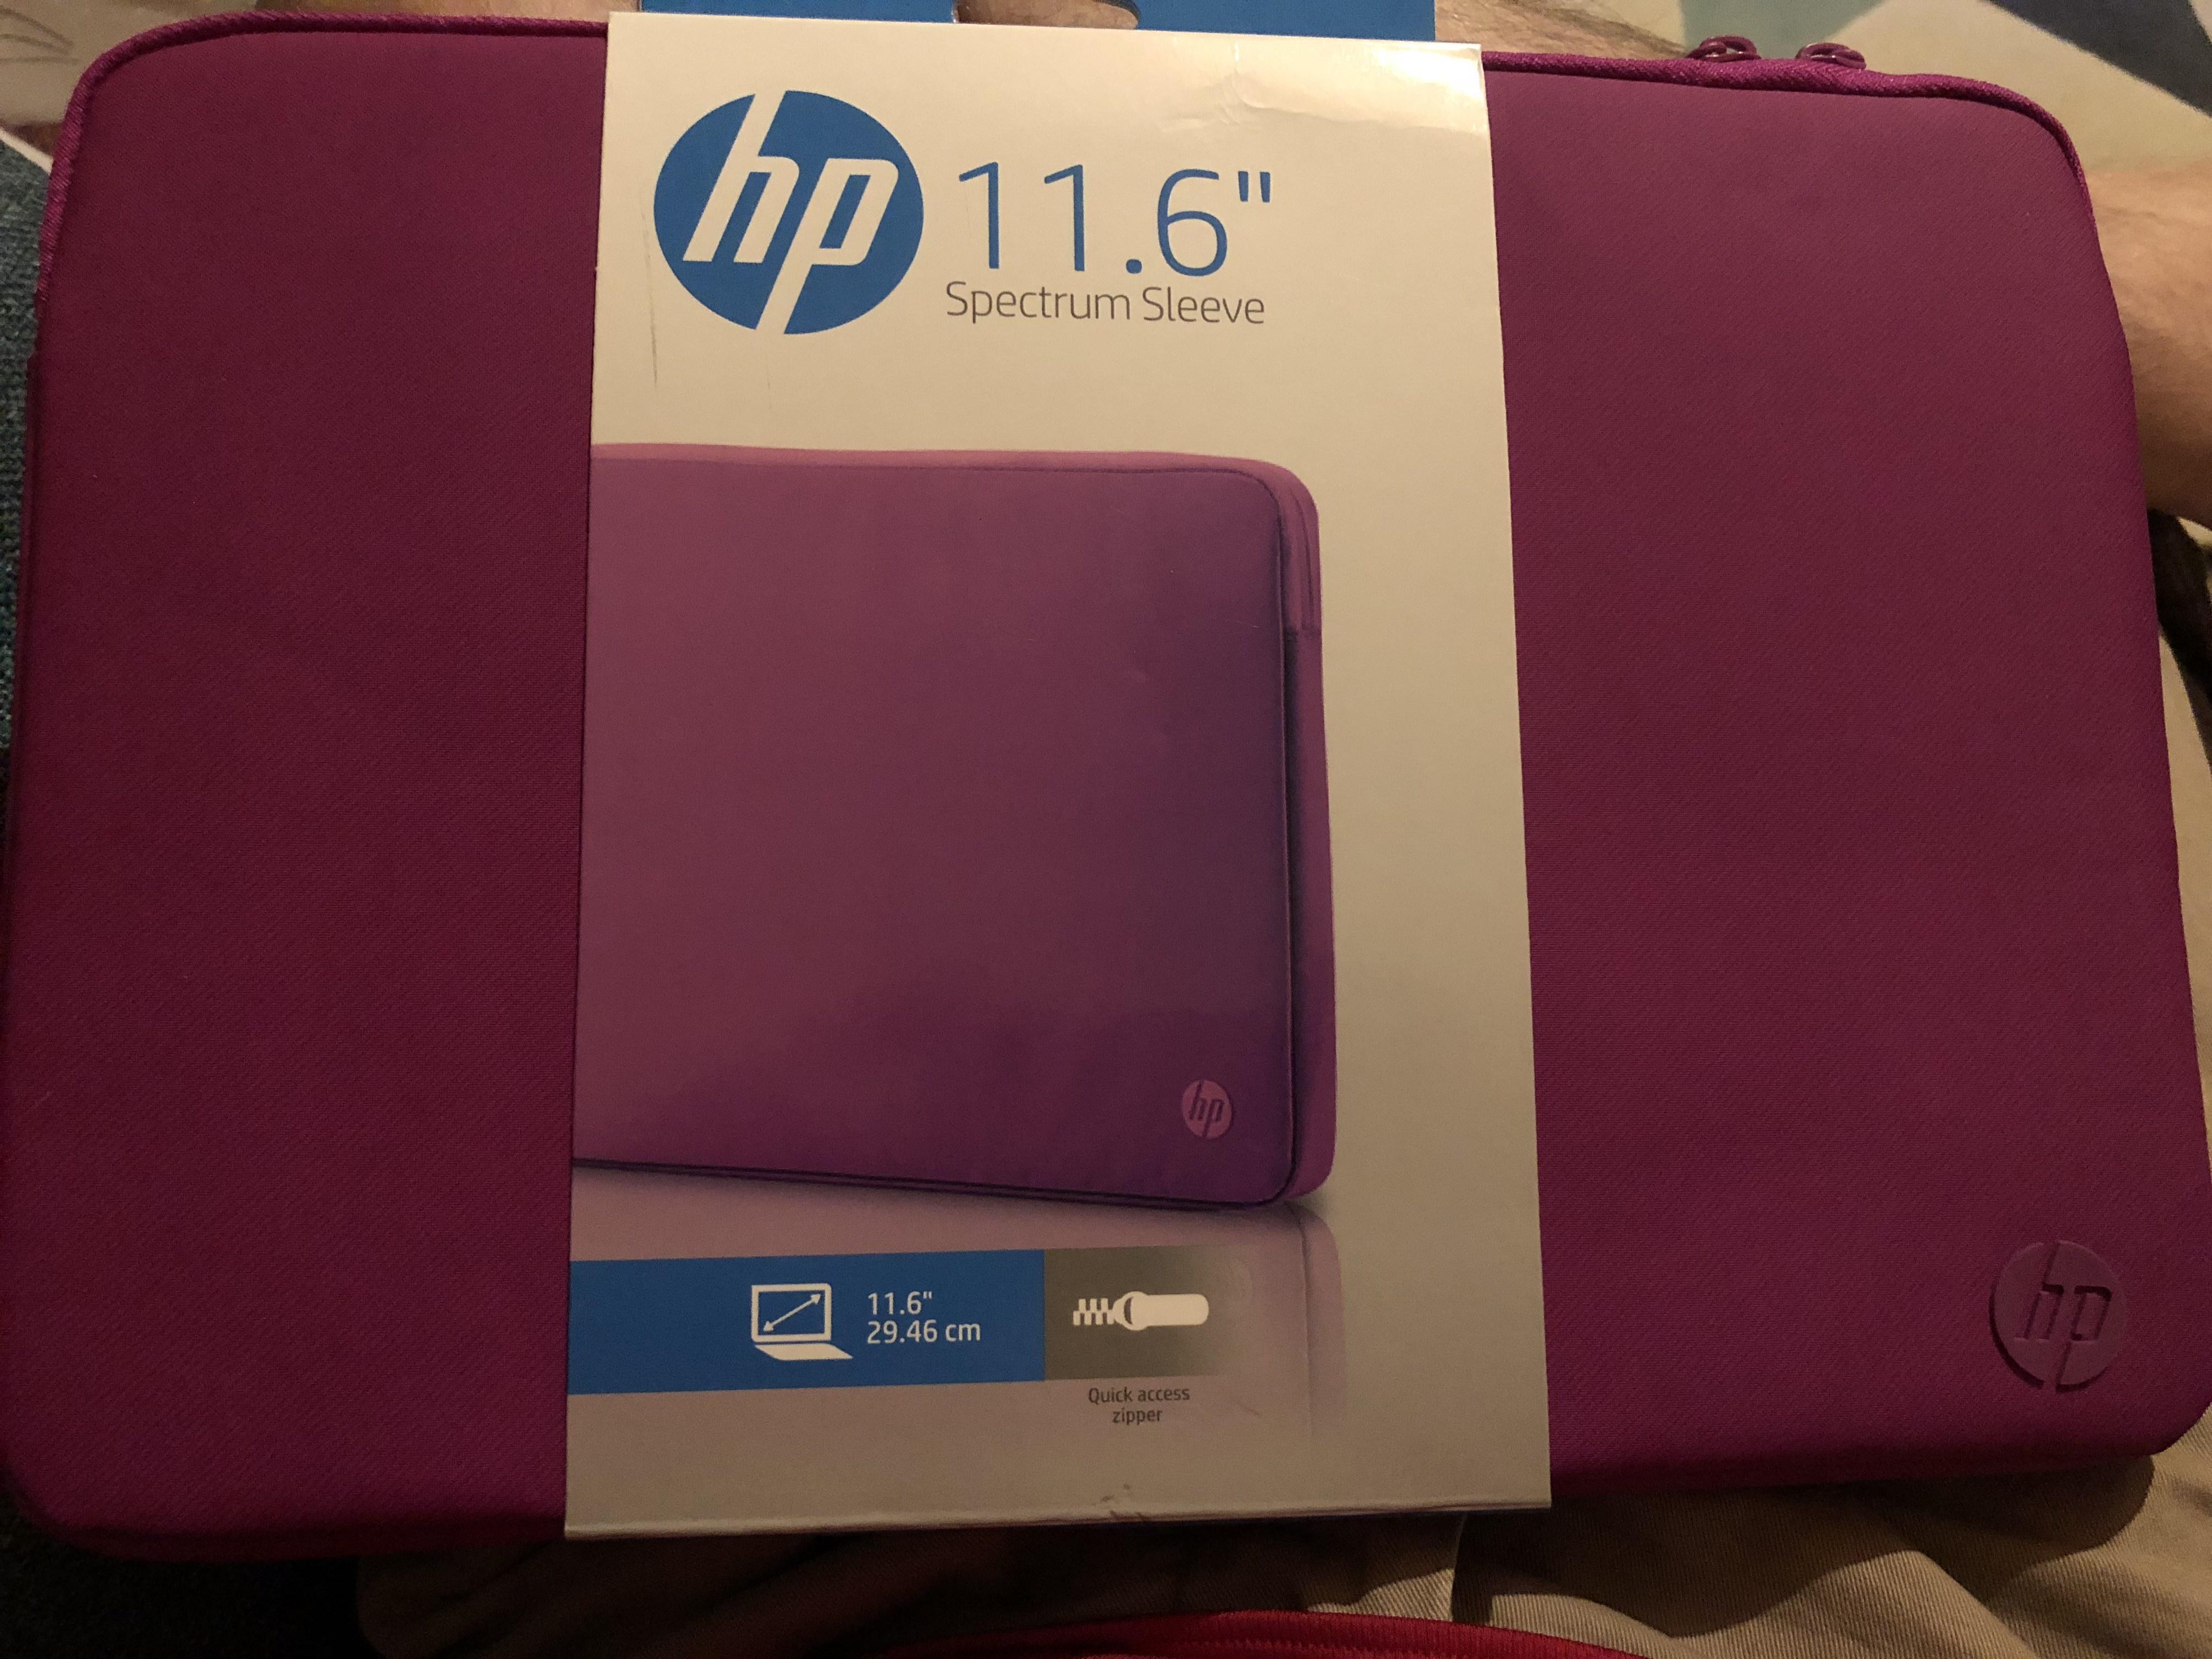 "HP 11.6"" spectrum sleeve for Hp stream - £2 instore Sainsbury's"